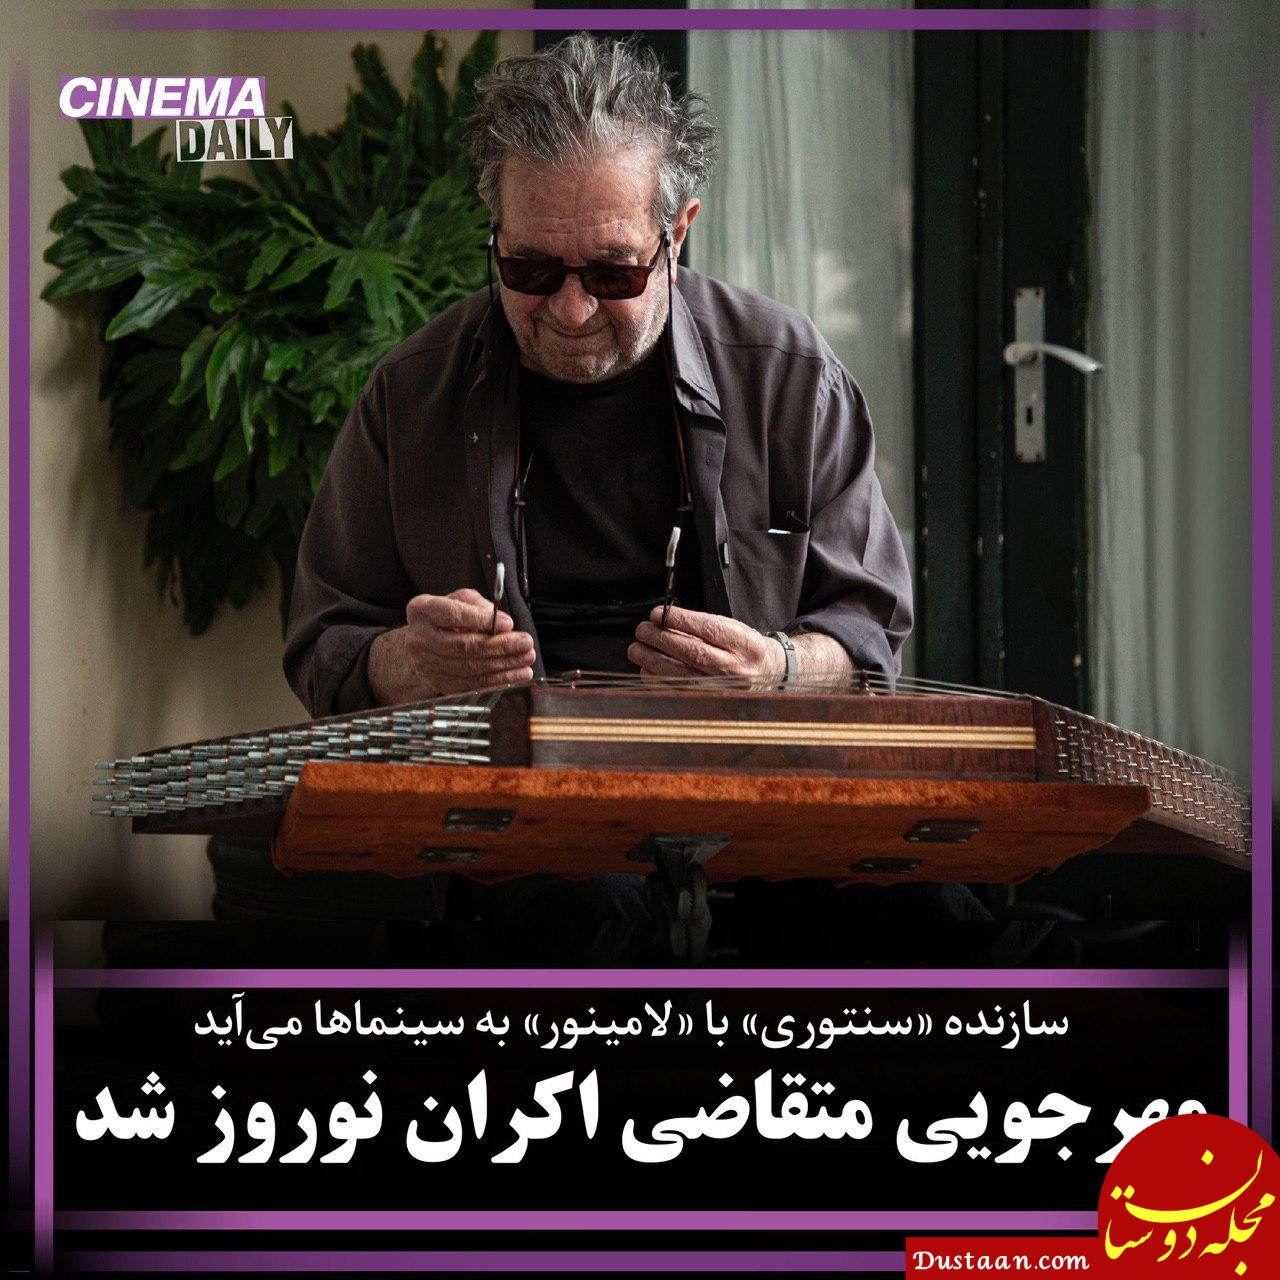 www.dustaan.com سازنده «سنتوری» با «لامینور» به سینماها می آید